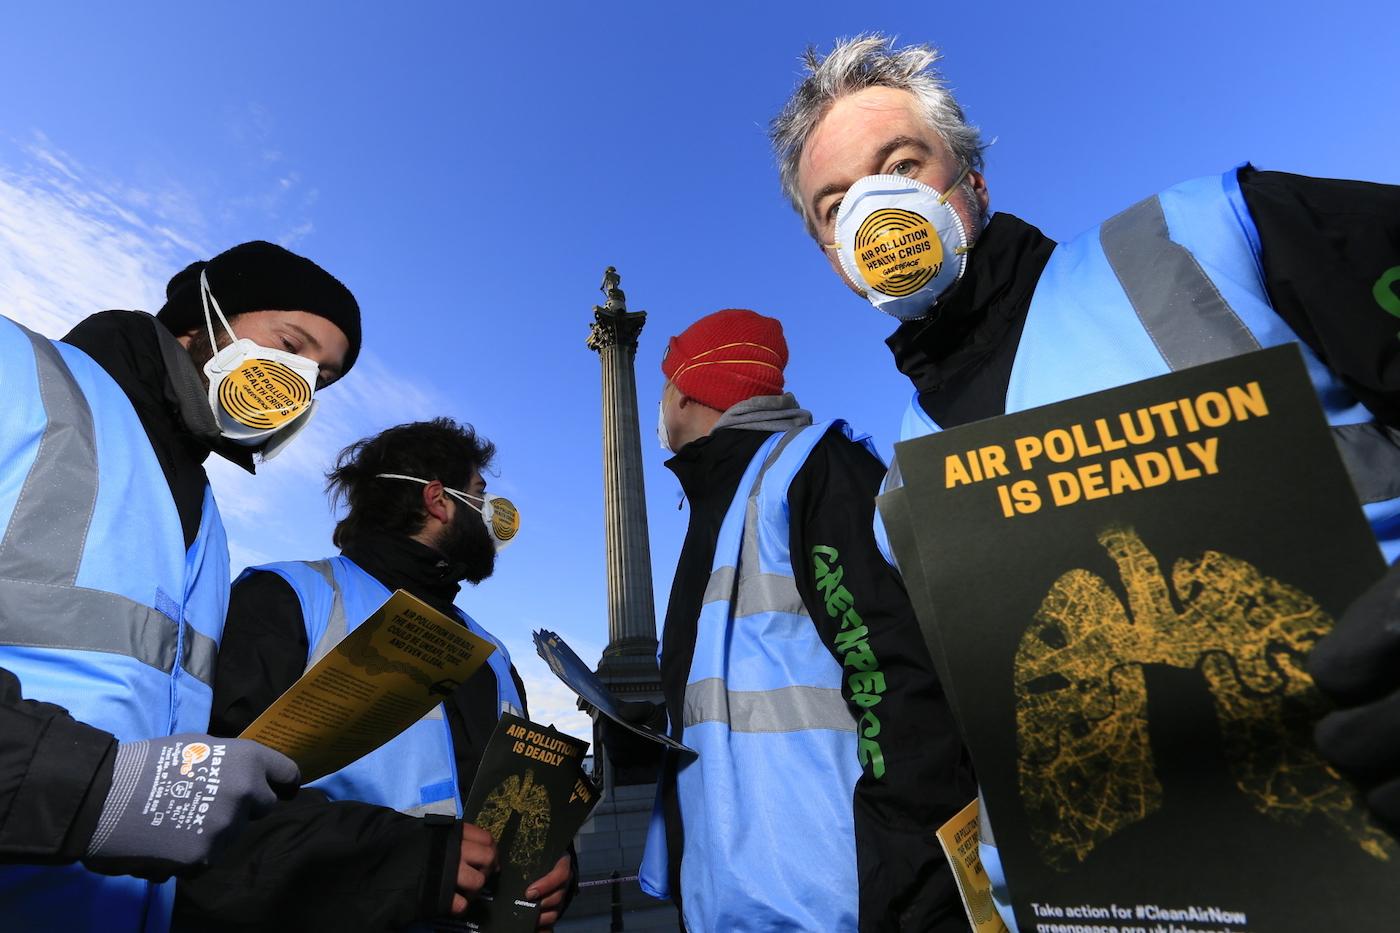 Greenpeace activists distribute leaflets during their protest (photo © Jiri Rezac / Greenpeace)